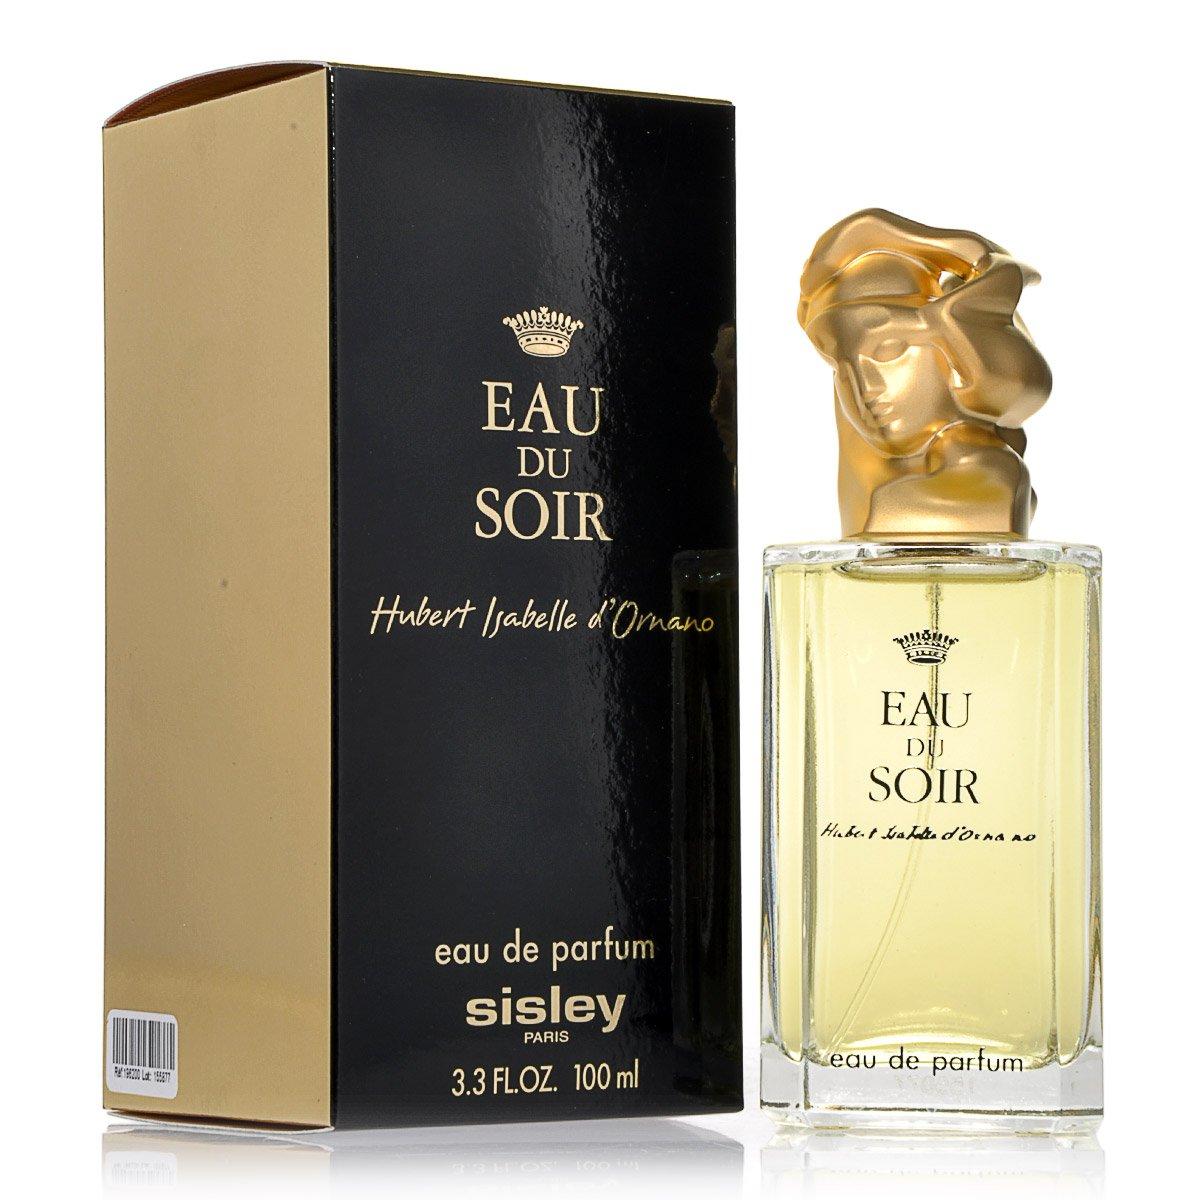 Eau Du Soir By Sisley For Women. Eau De Parfum Spray 3.3 Ounces by Sisley (Image #1)